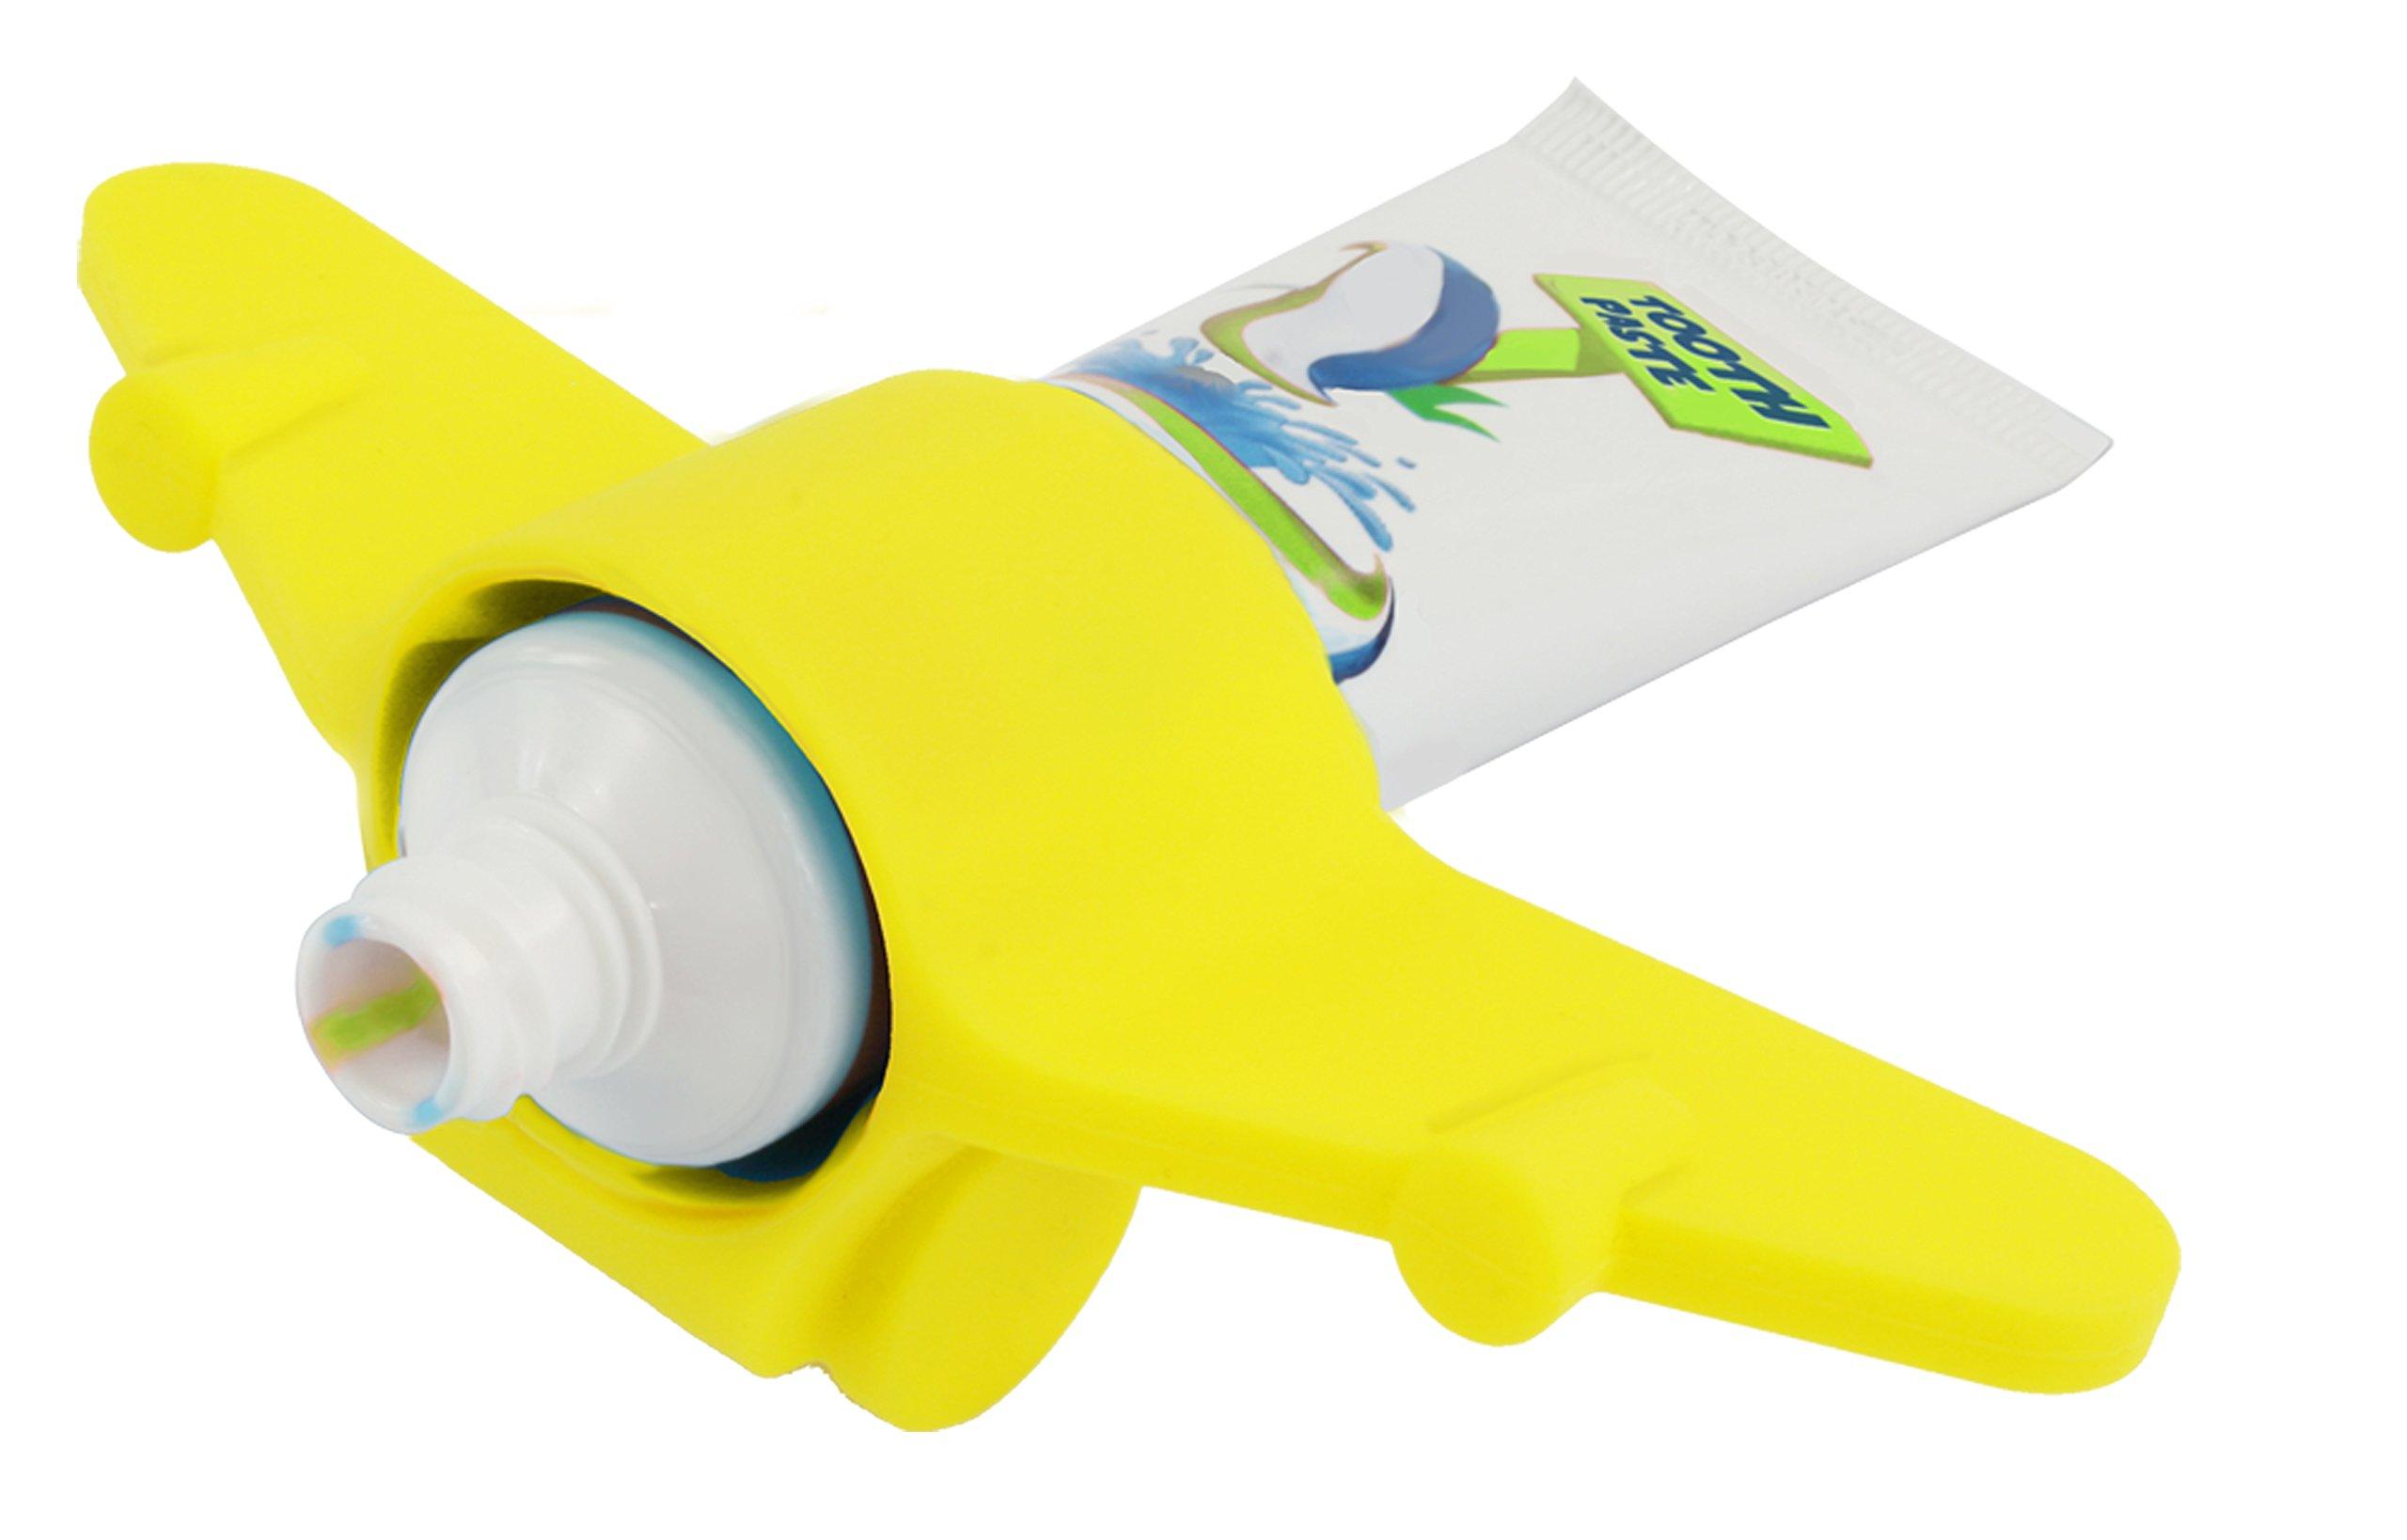 Plane Toothpaste Holder (Yellow)